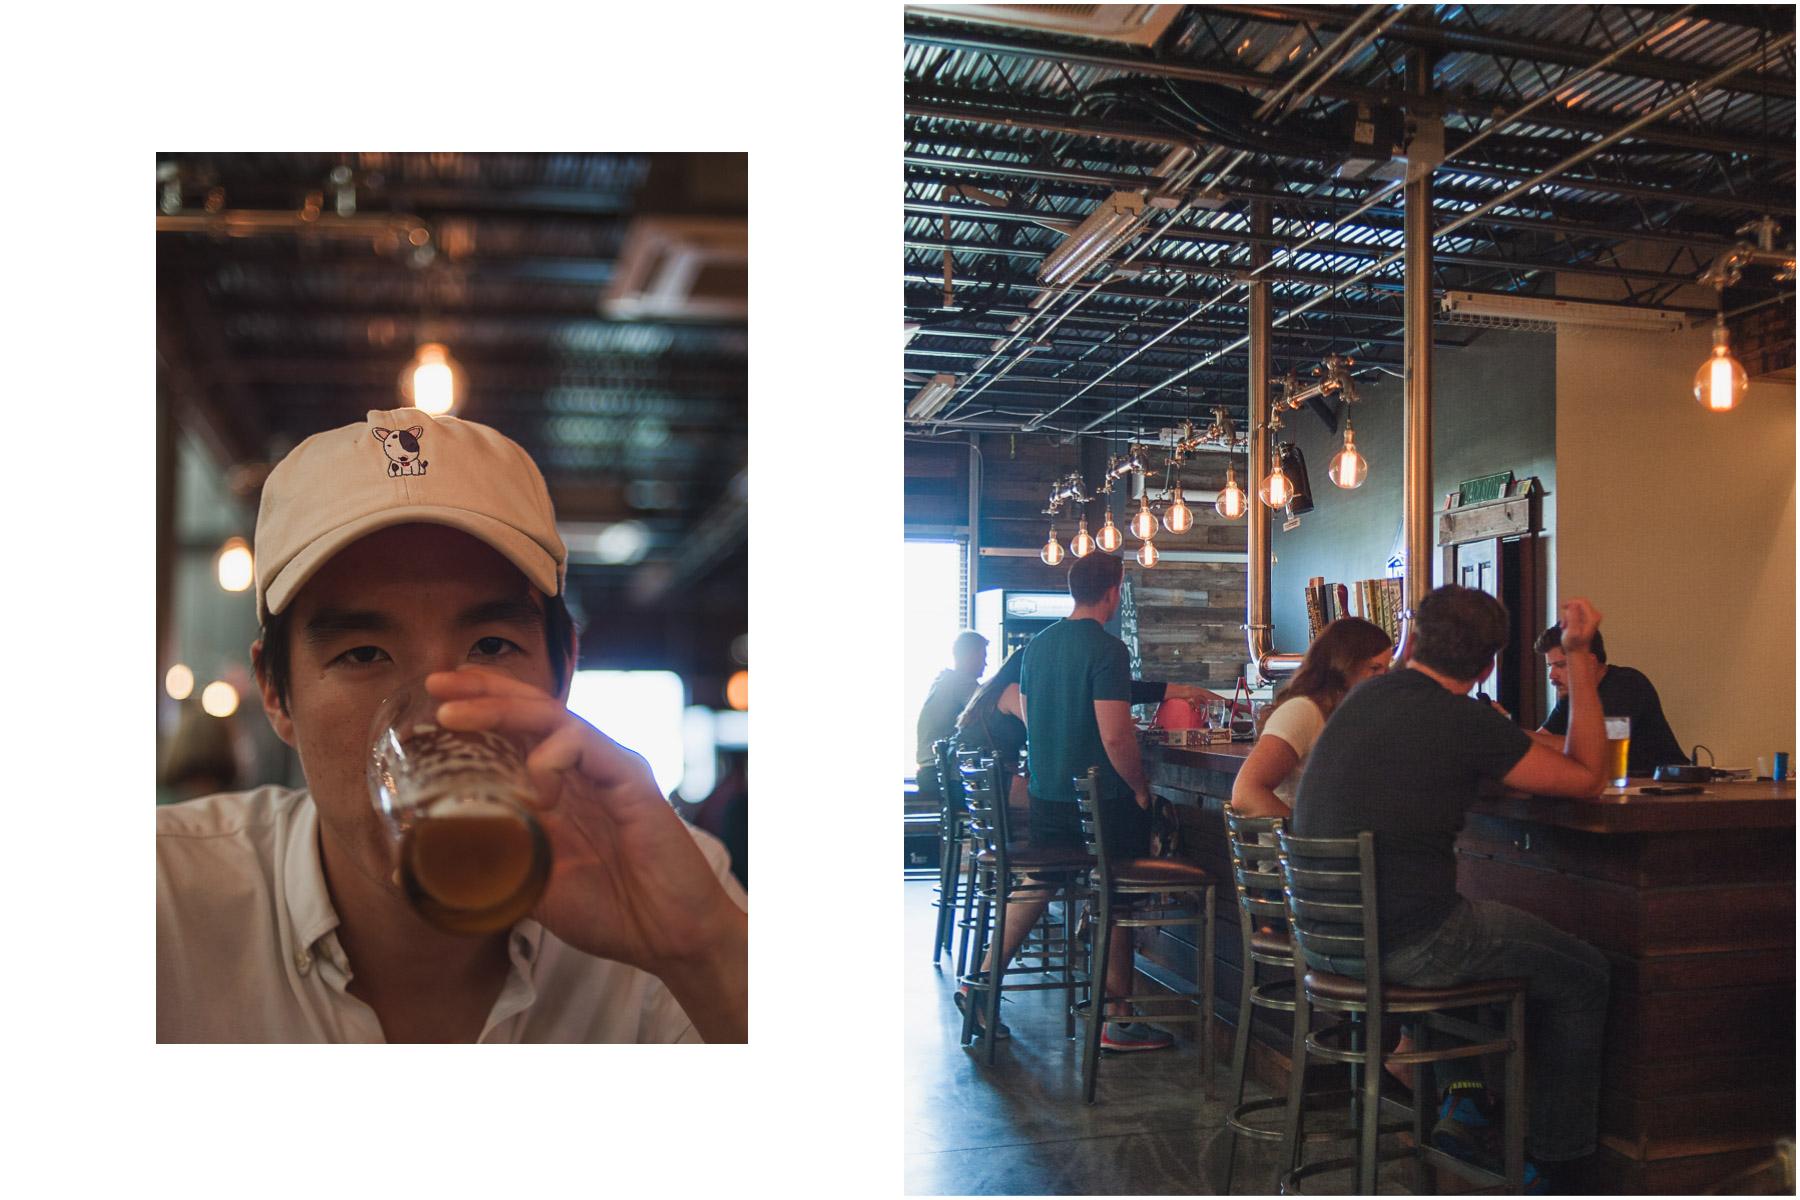 Nashville-Day-4_Blackstone-Brewing-Company_11.jpg